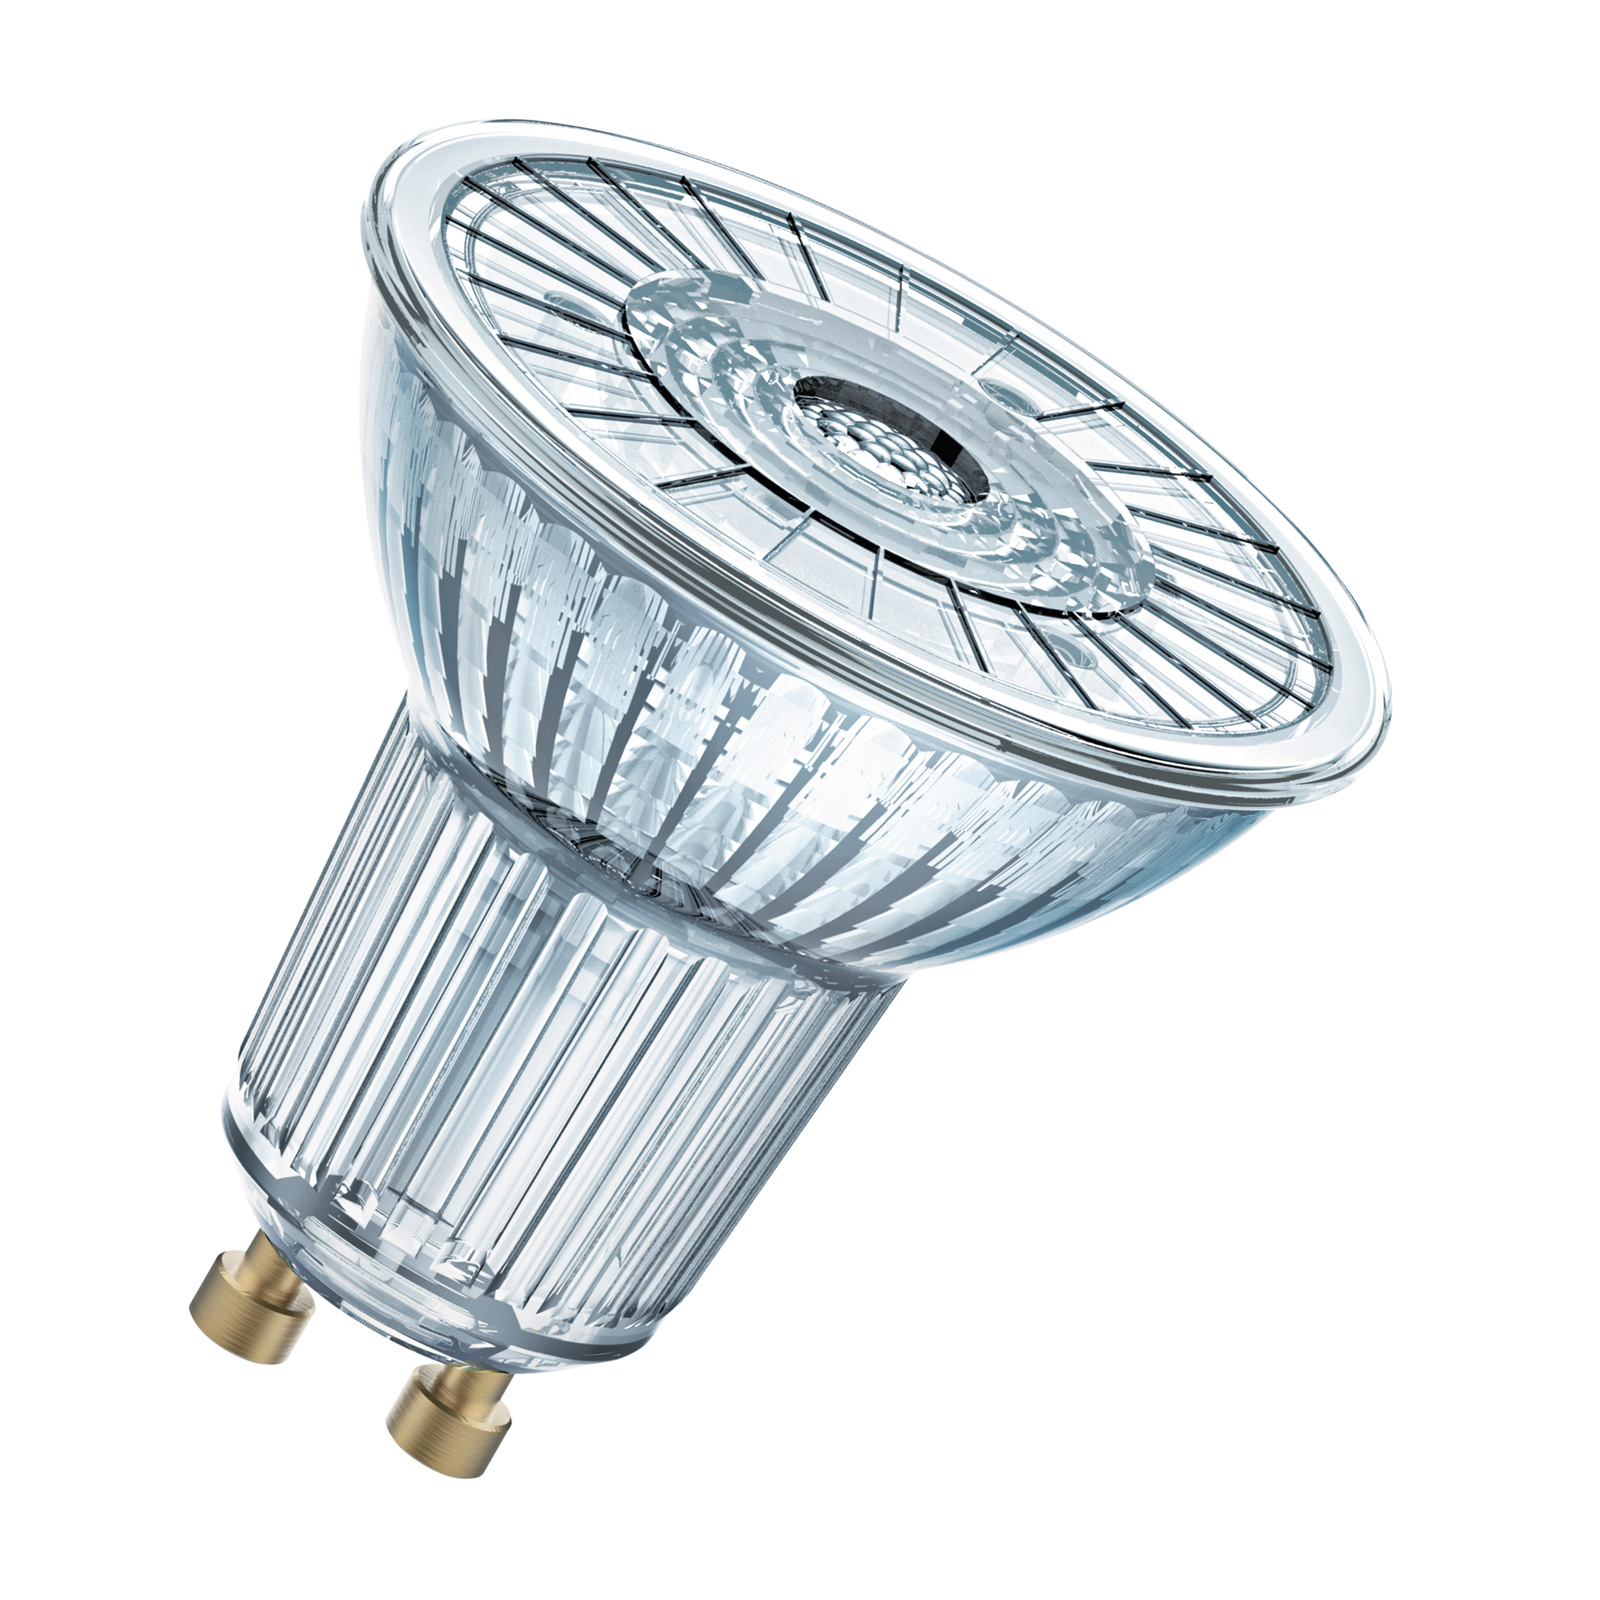 11048-OSRAM-LED-PARATHOM-PAR16-GU10-3W-wie-35-Watt-3000K-230lm-36-warmweiss-dimmbar-2 Schöne Osram Led Dimmbar Gu10 Dekorationen